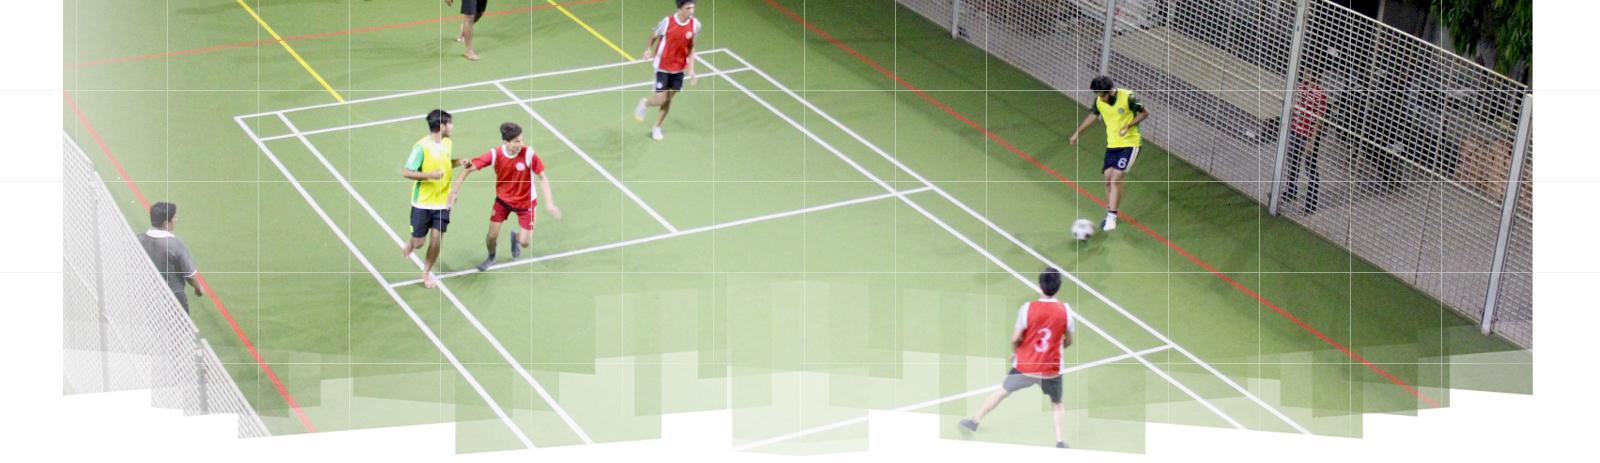 sports-slide5